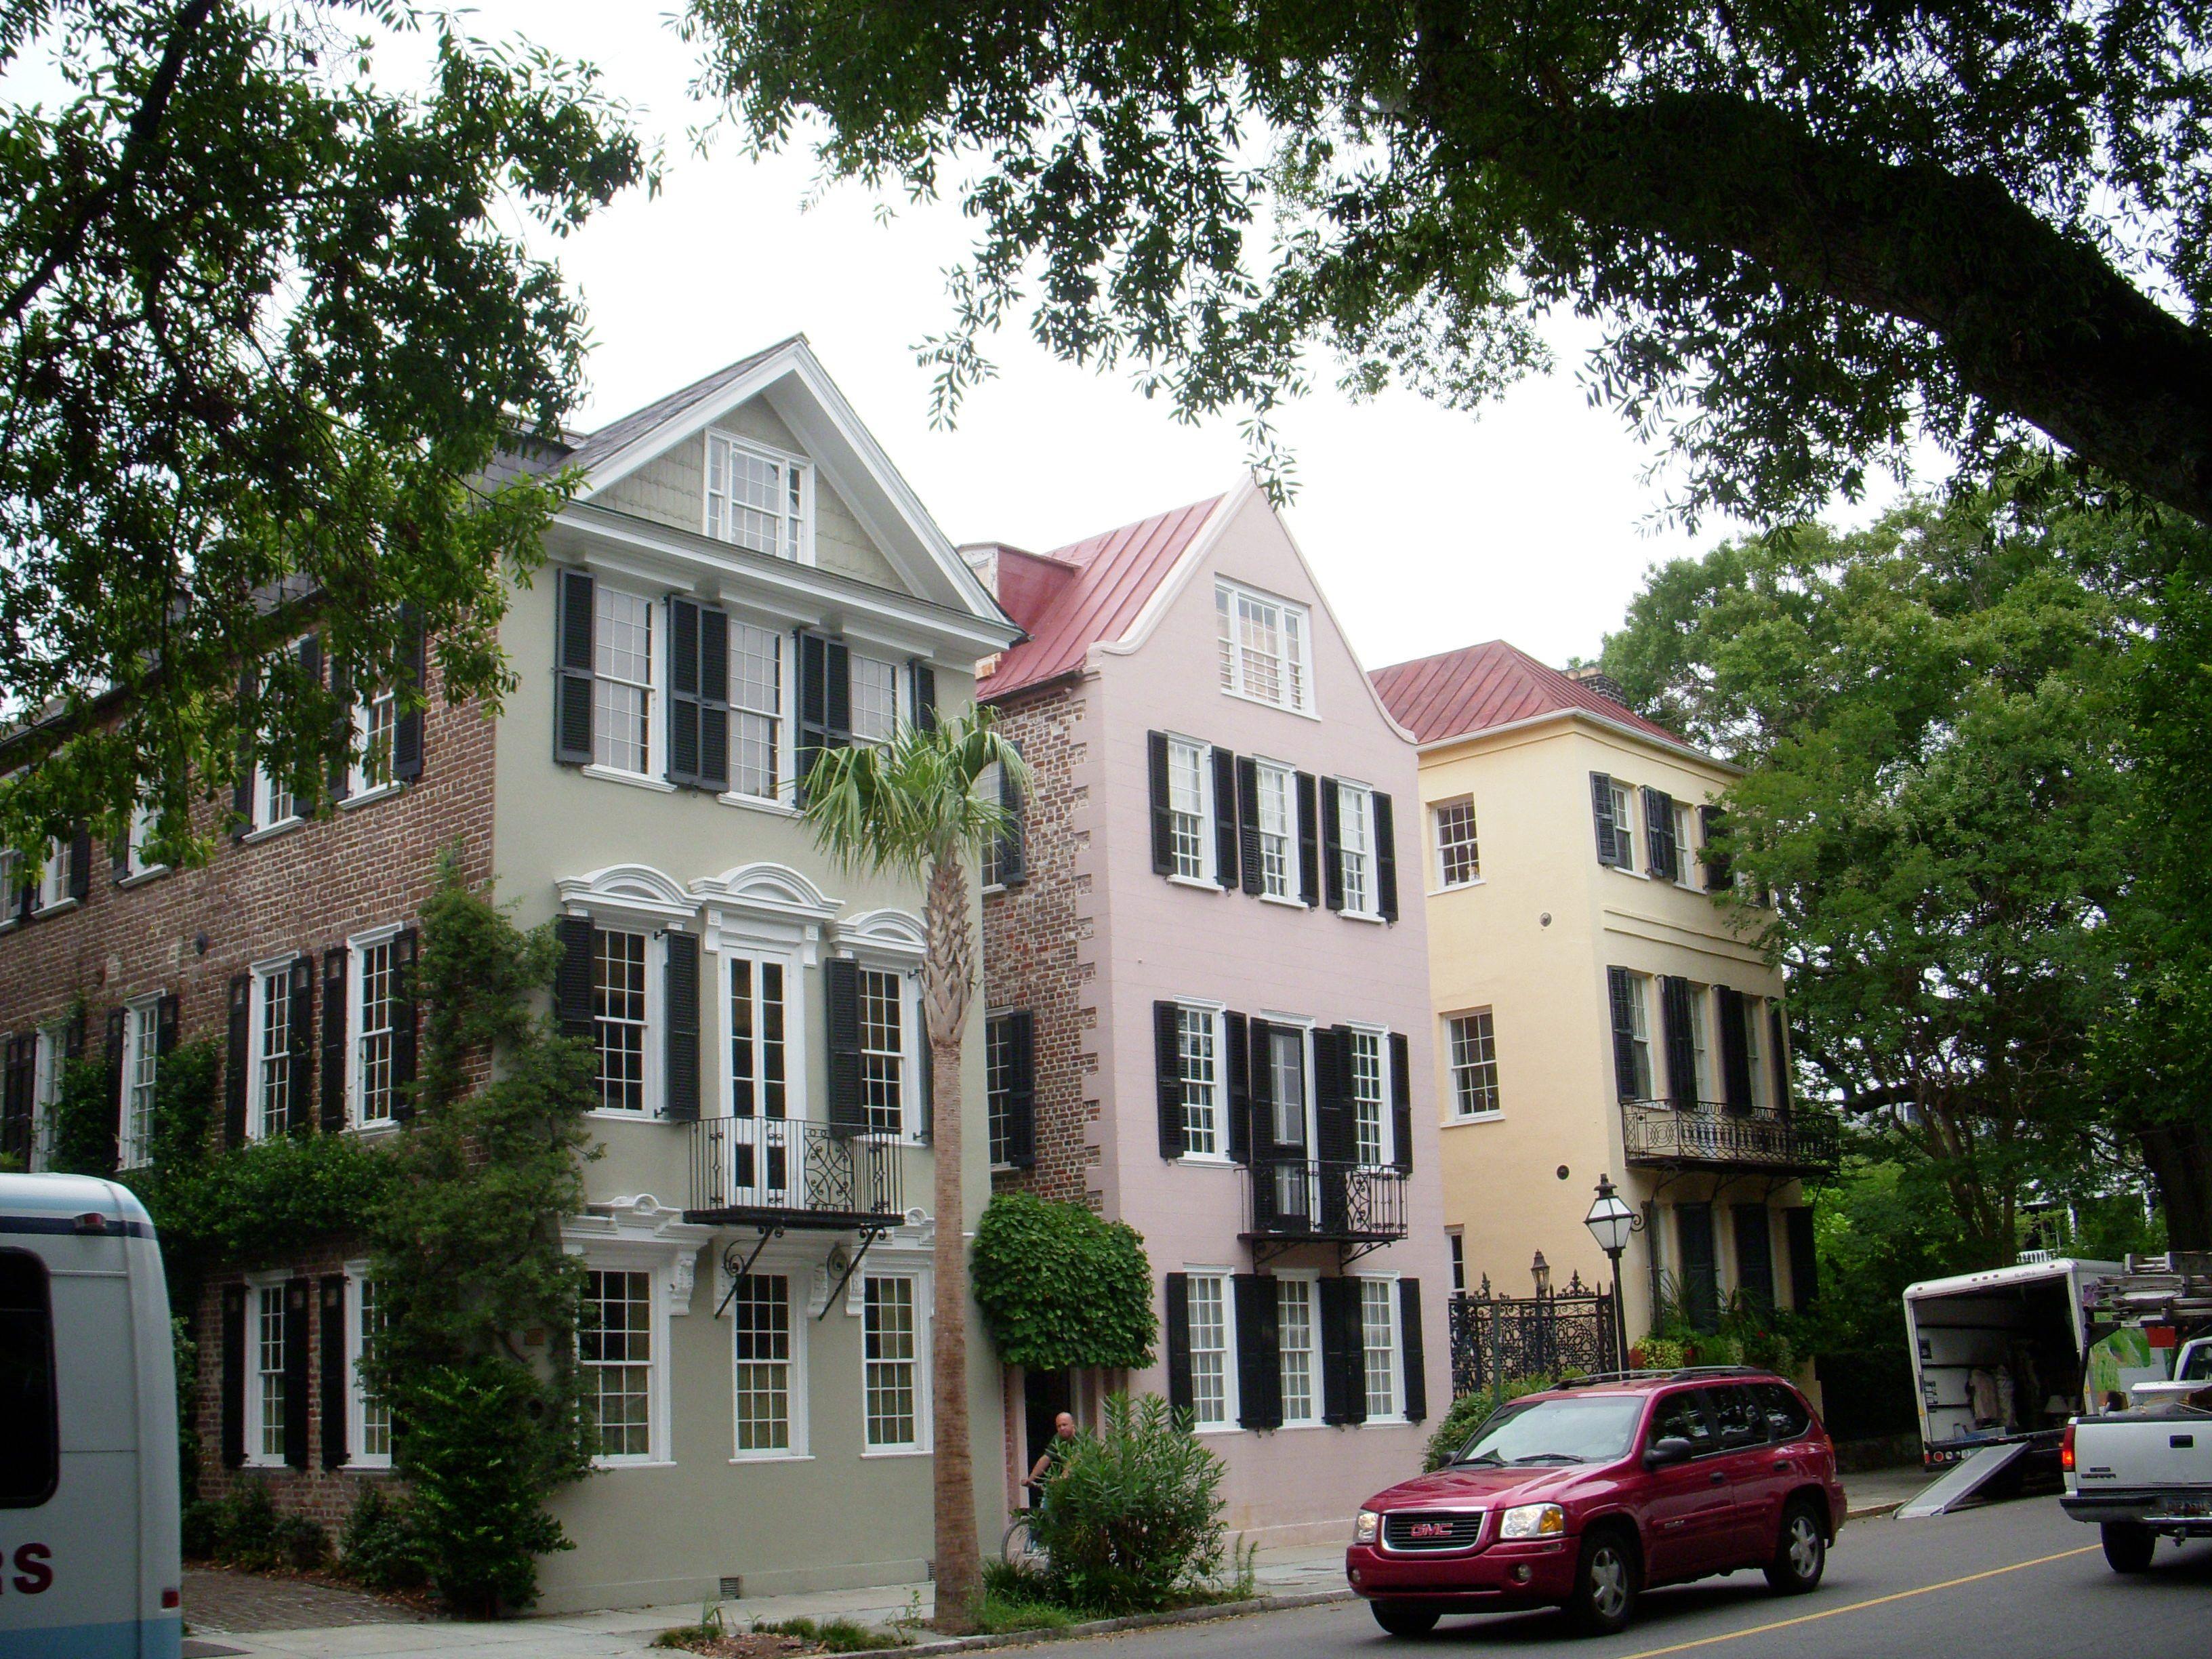 Rainbow row charleston south carolina homes pinterest for Charleston row houses